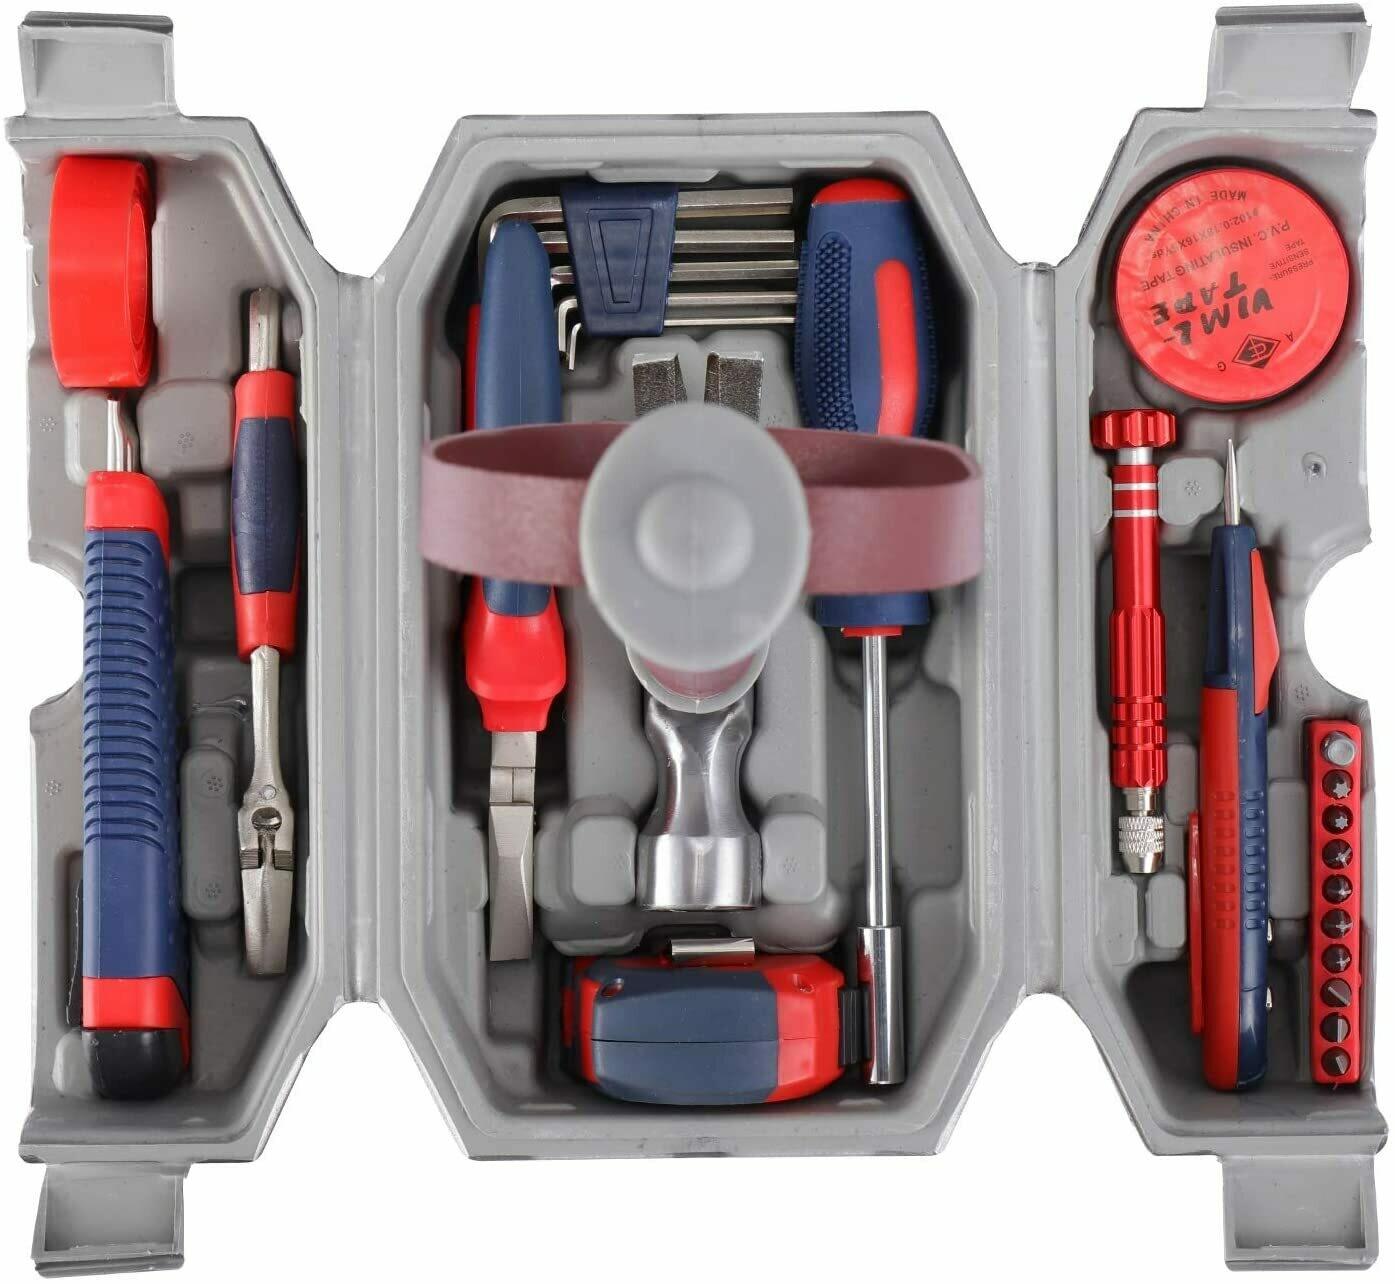 Avengers Marvel Legends Series Mjolnir Hammer Tool Kit, Daily Repair Filled Household Tool Case Pliers ect DIY Repair Kits Multi Tools Thor Hammer Accessories Set